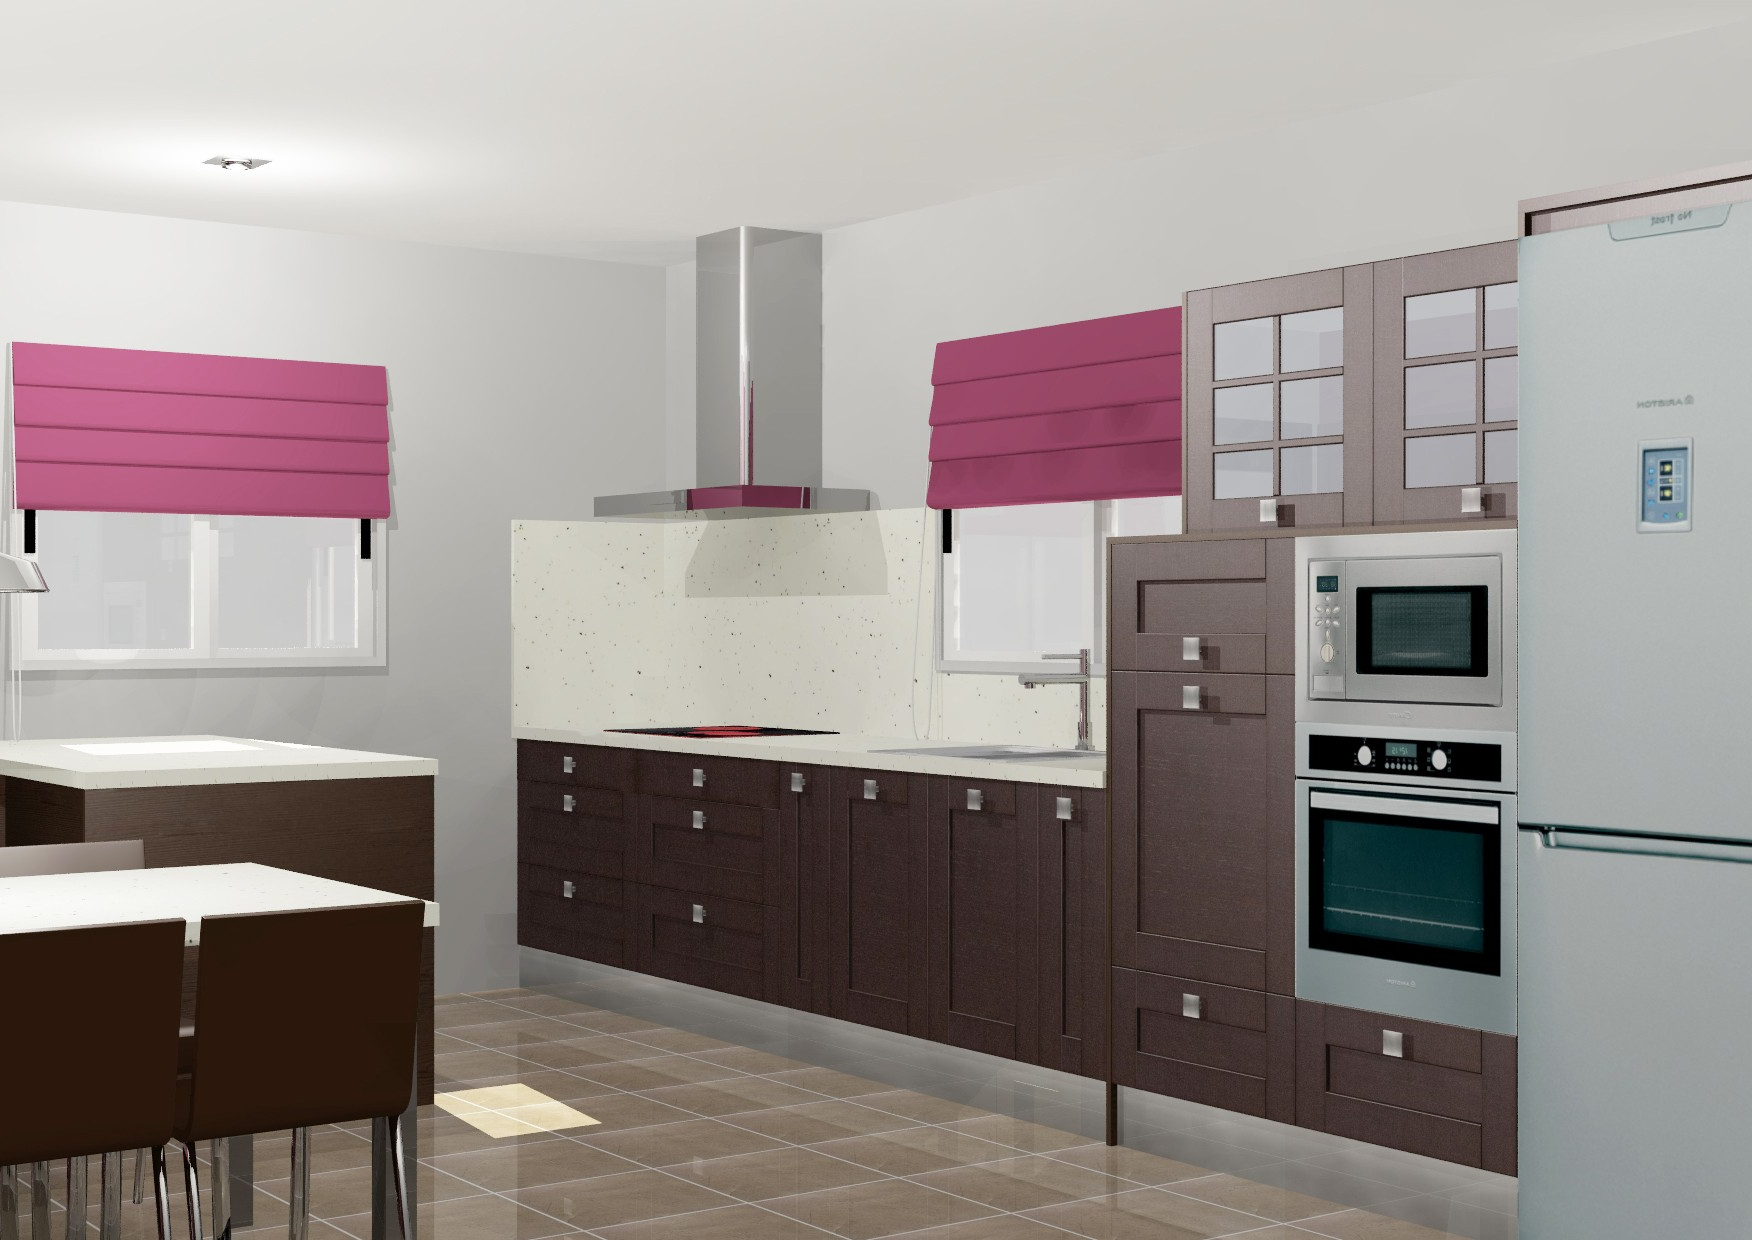 Comprar Muebles De Cocina E9dx Muebles De Cocina Baratos Online Prar Cocinas Online Sercosan